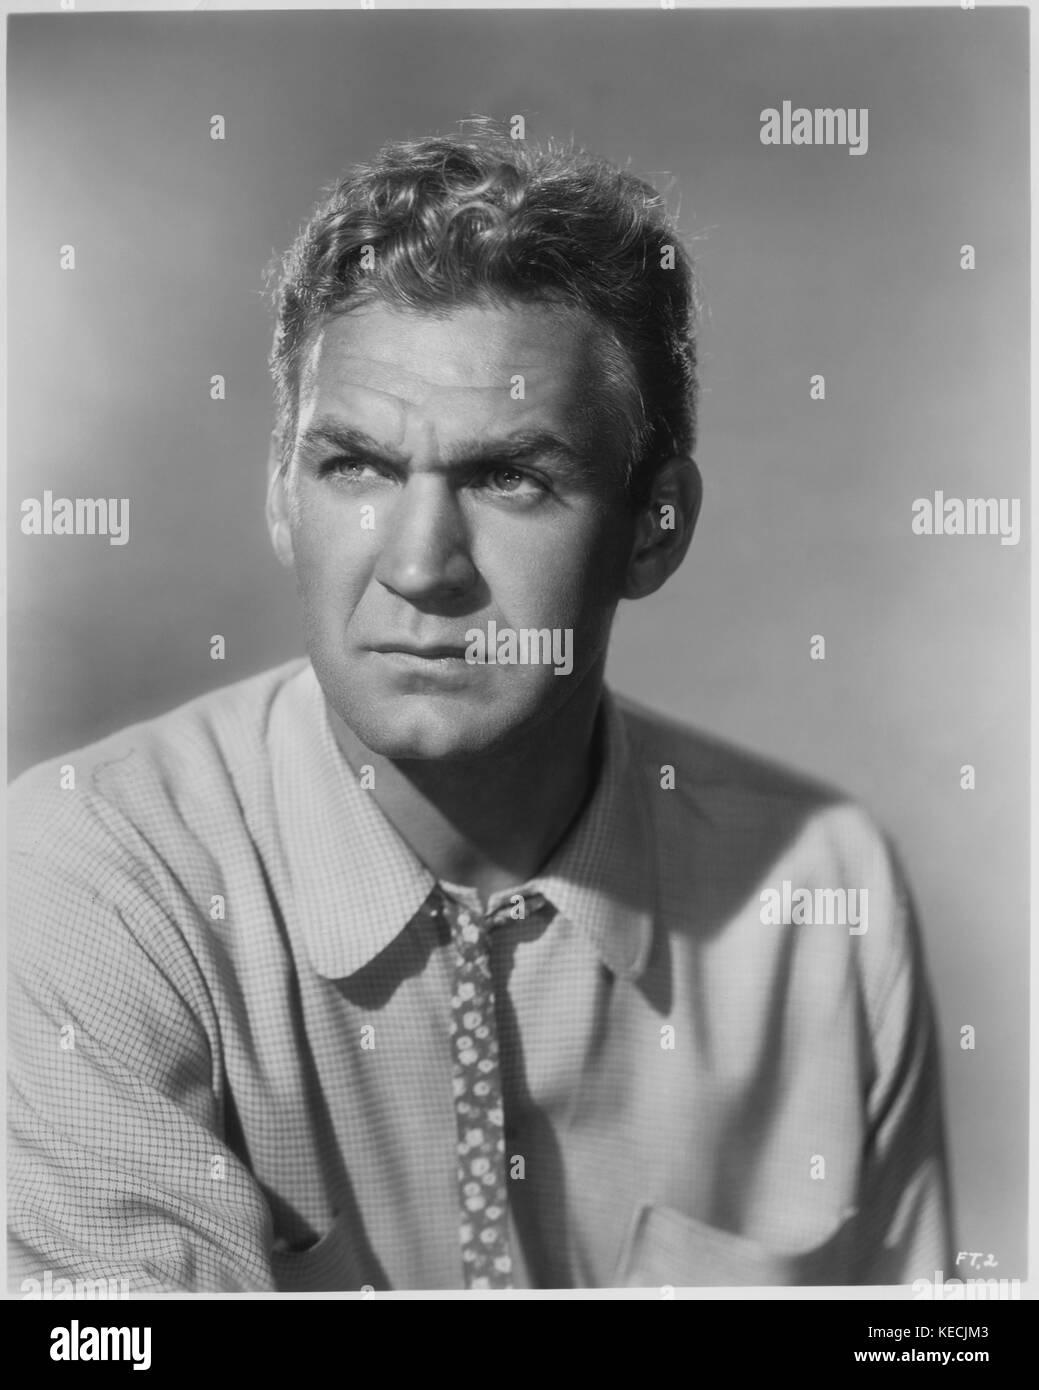 Actor Forrest Tucker, Publicity Portrait, Roman Freulich for Republic Pictures, 1950 - Stock Image